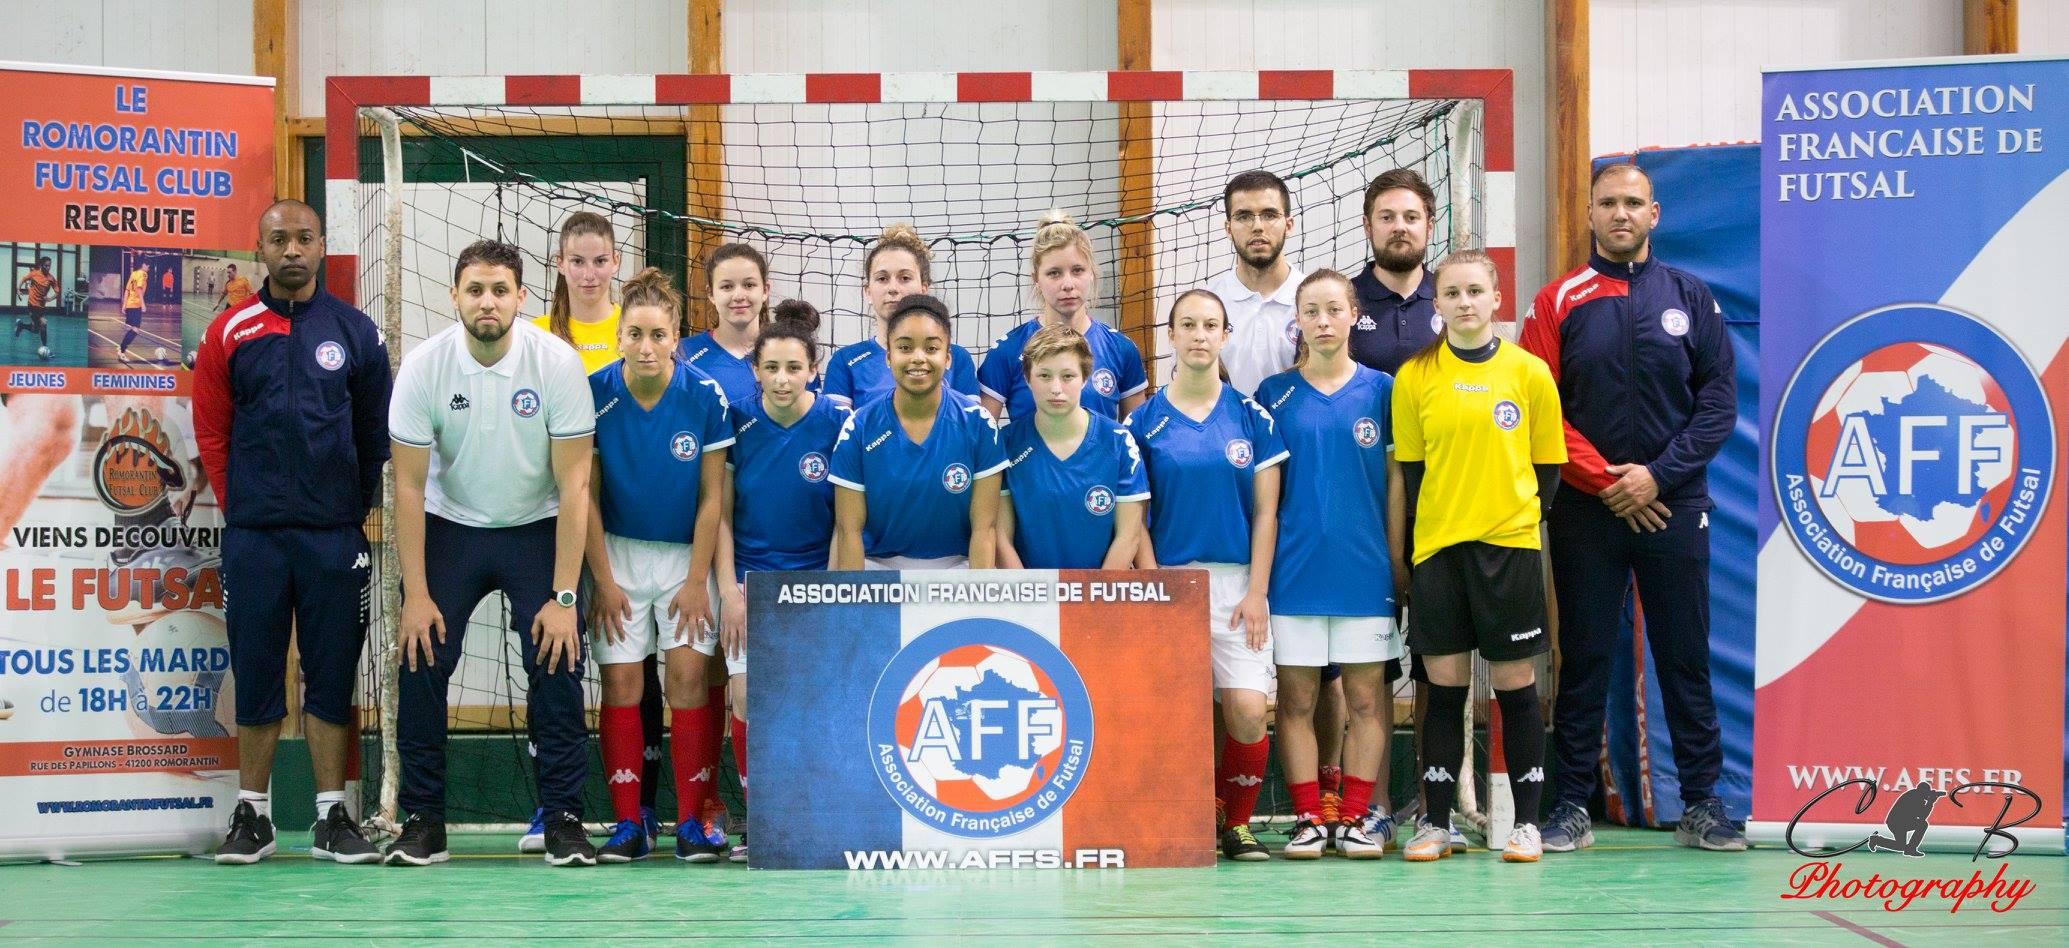 equipe de france futsal feminin aff